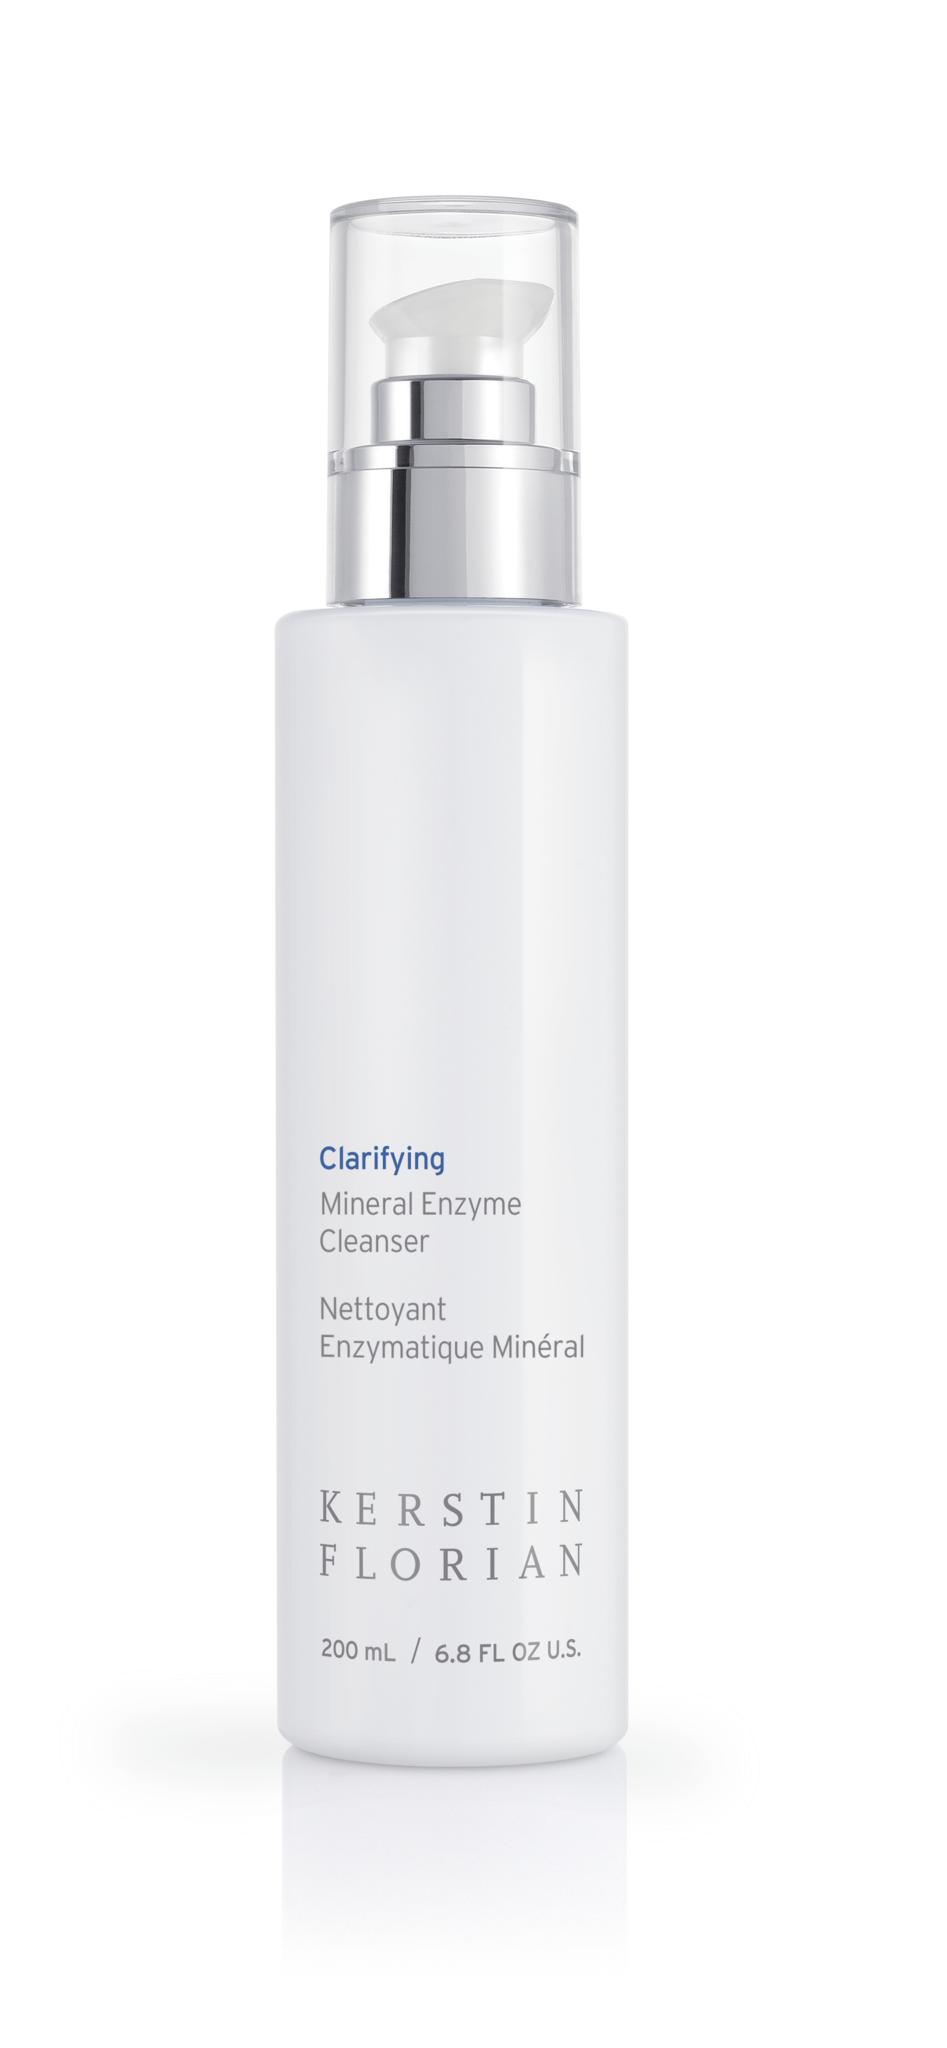 Очищающий гель для проблемной кожи/ Clar. Mineral Enzyme Cleanser (200 мл)